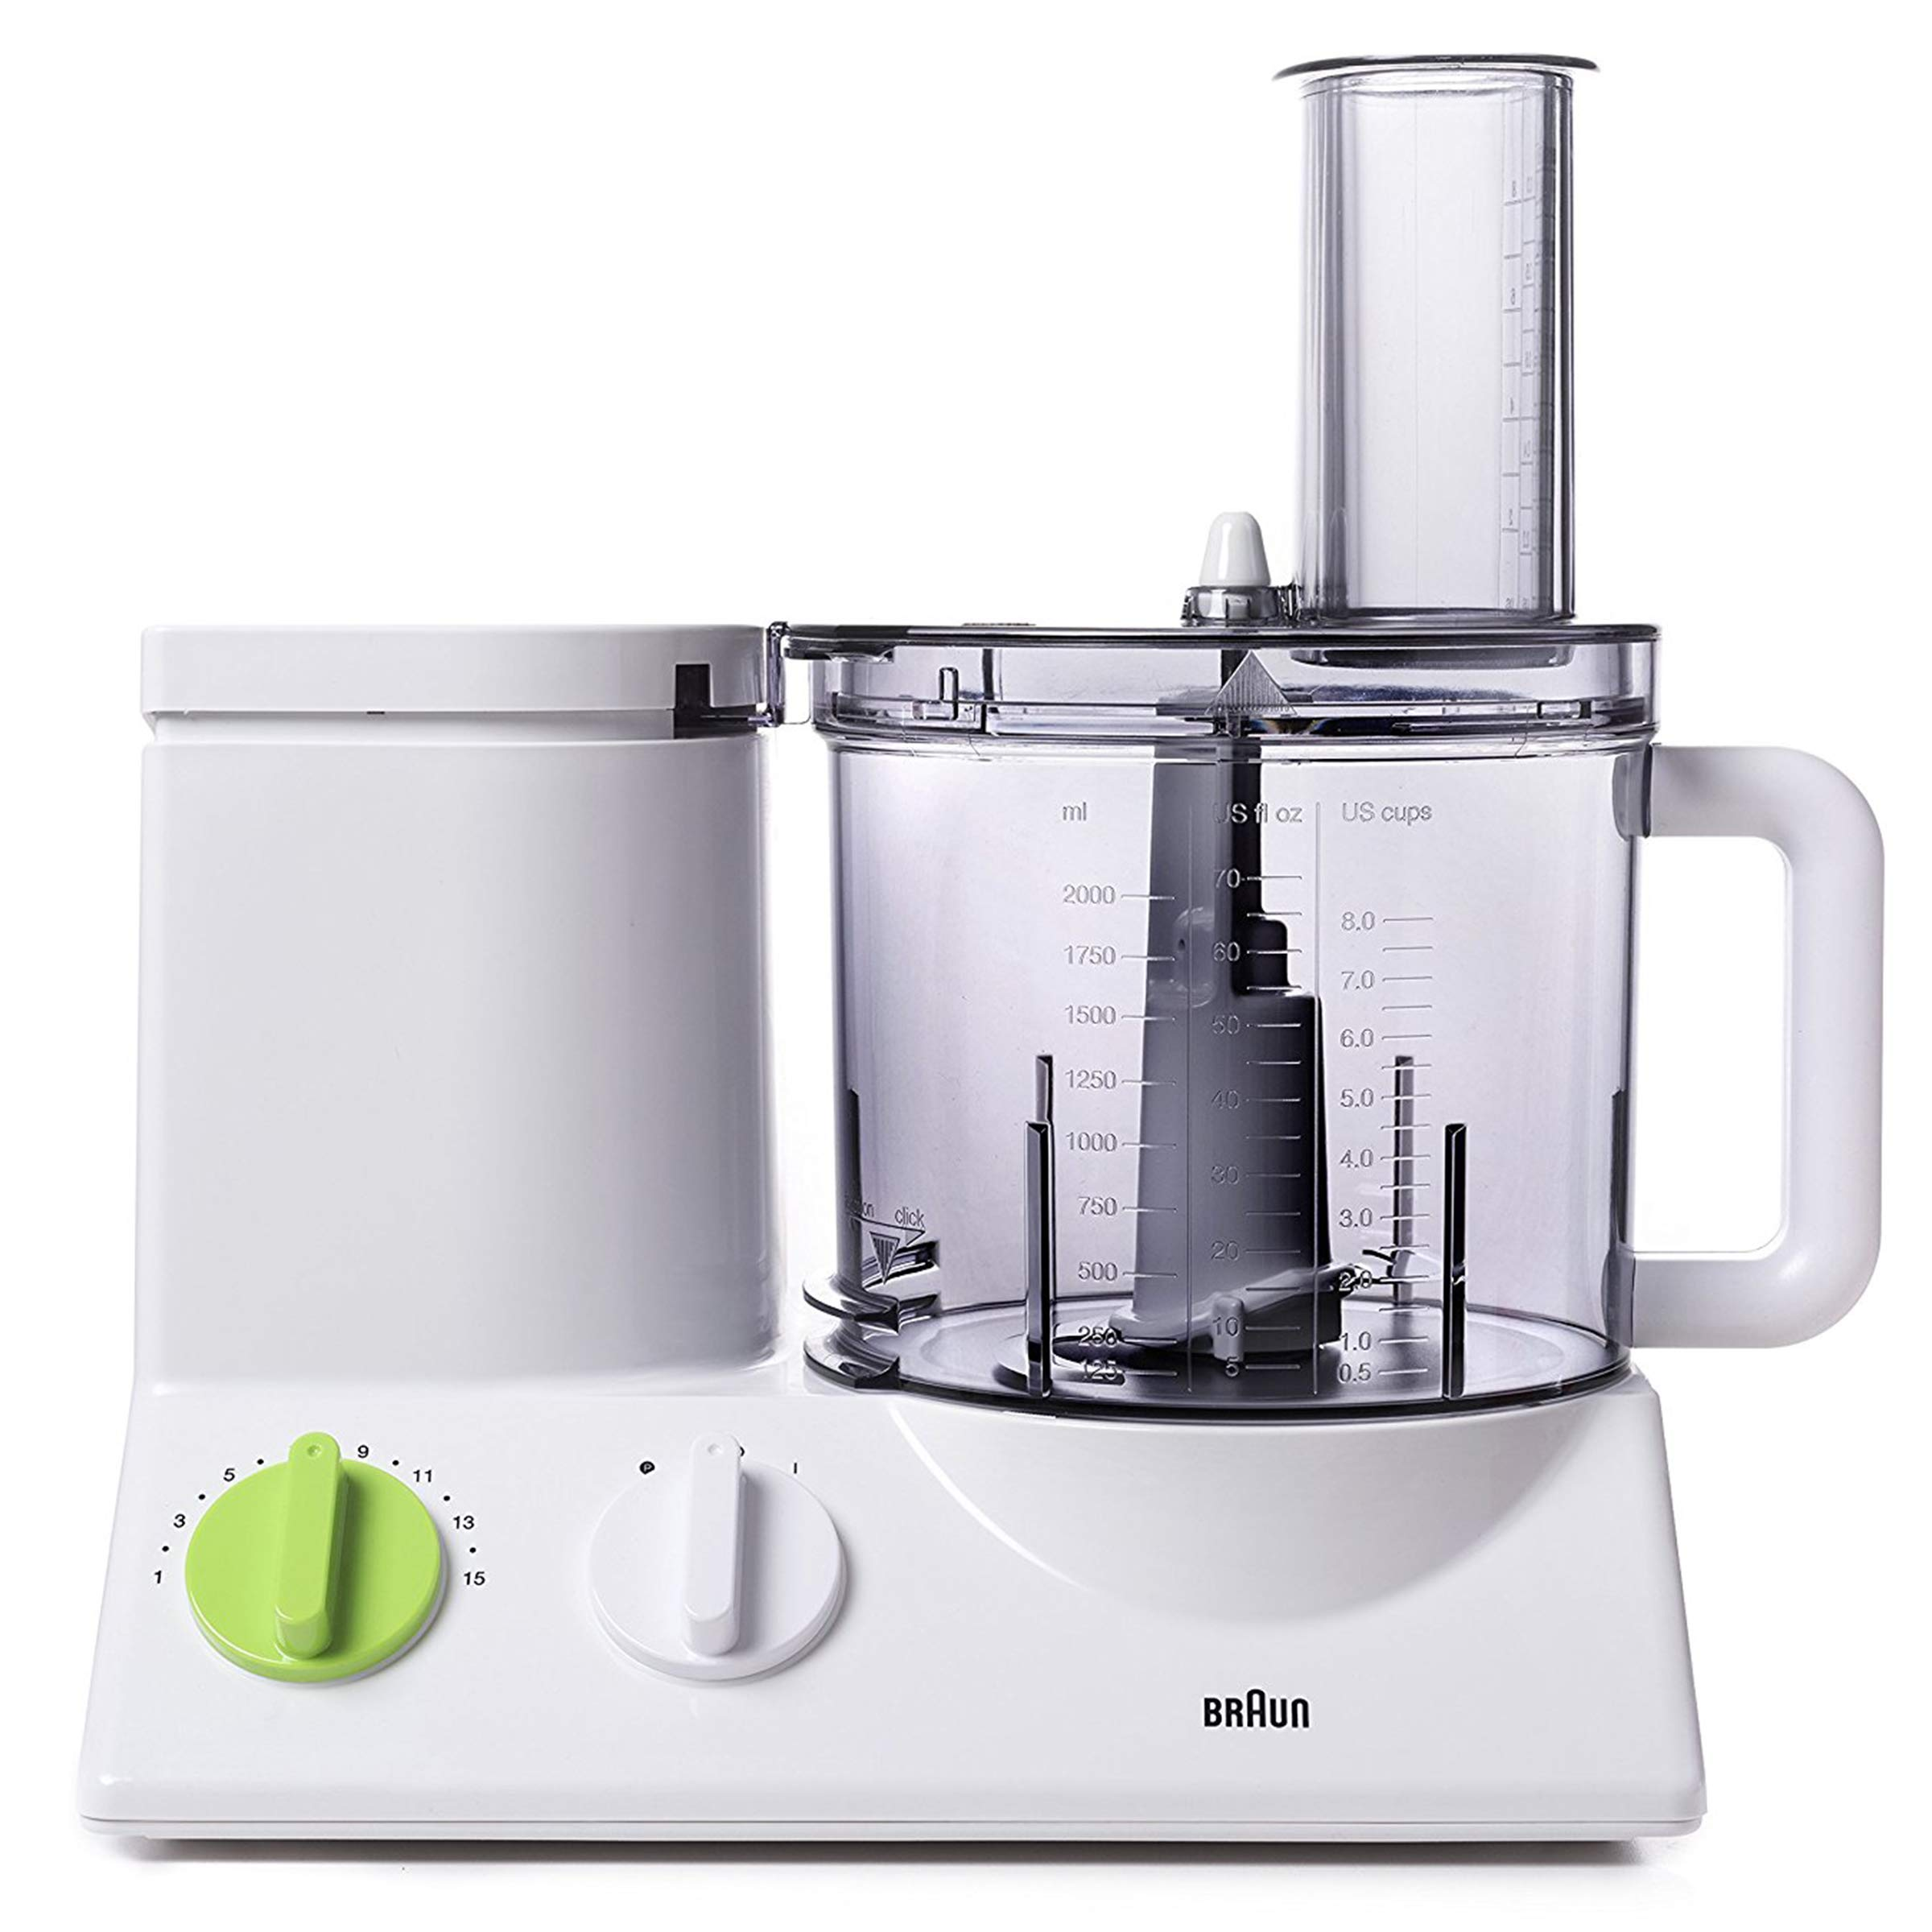 Braun FP3020 12 Cup FoodProcessor